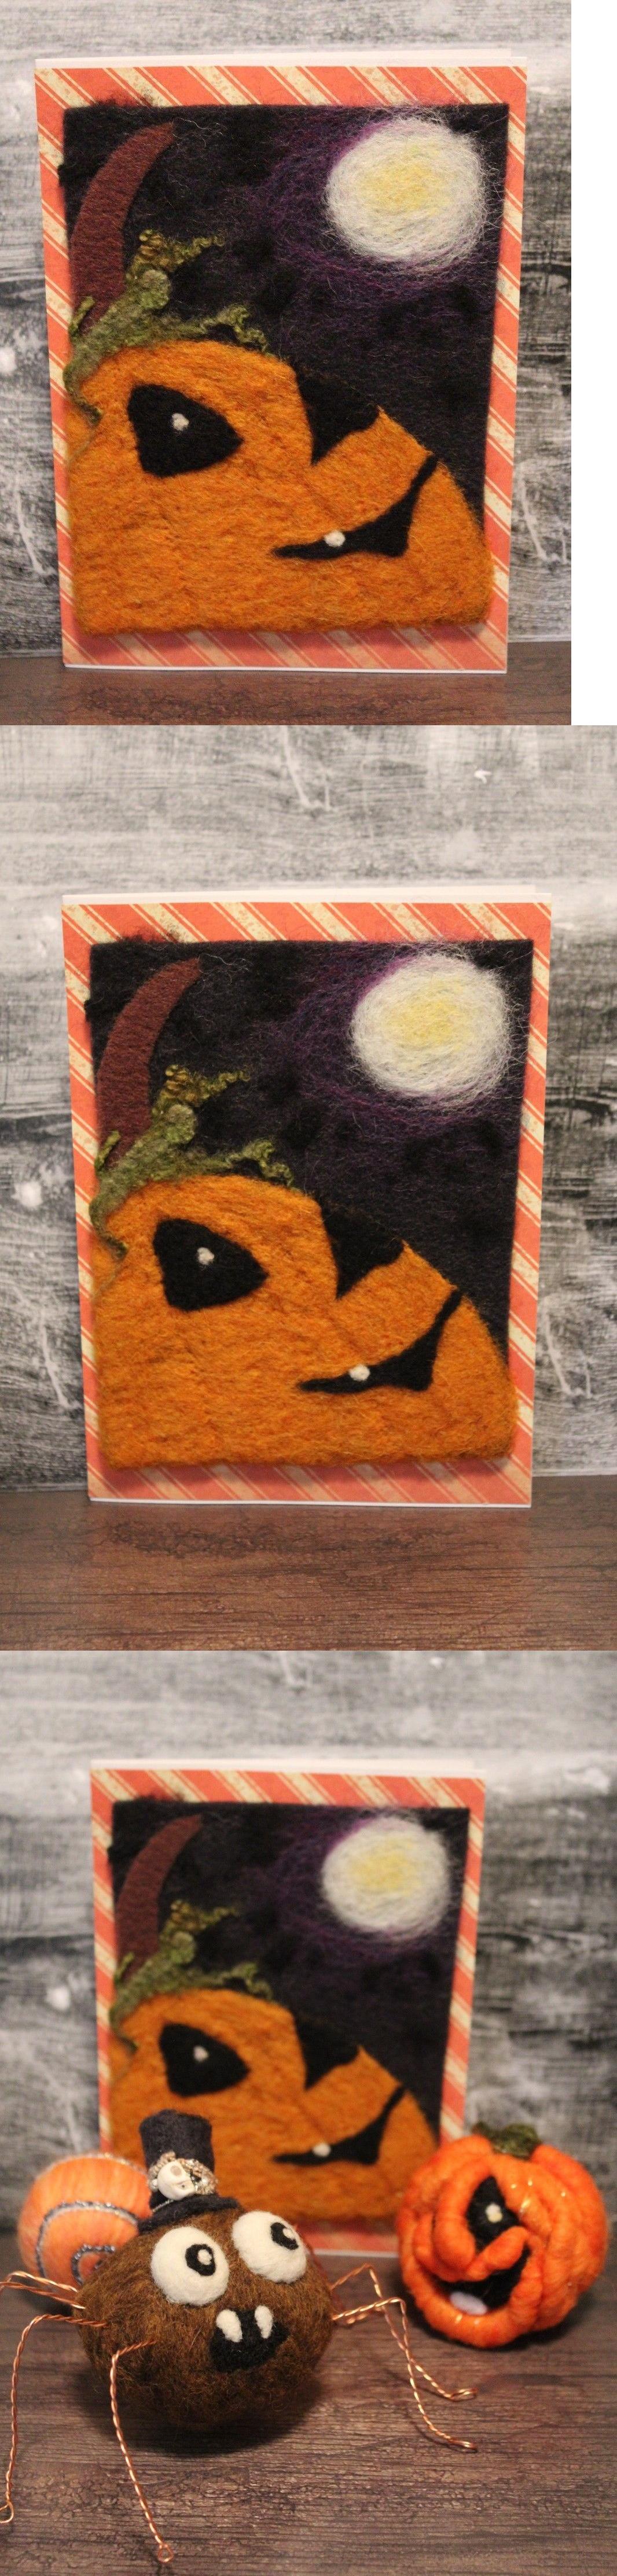 Wool And Needlefelted Items 160664 Halloween Moon Pumpkin Needle